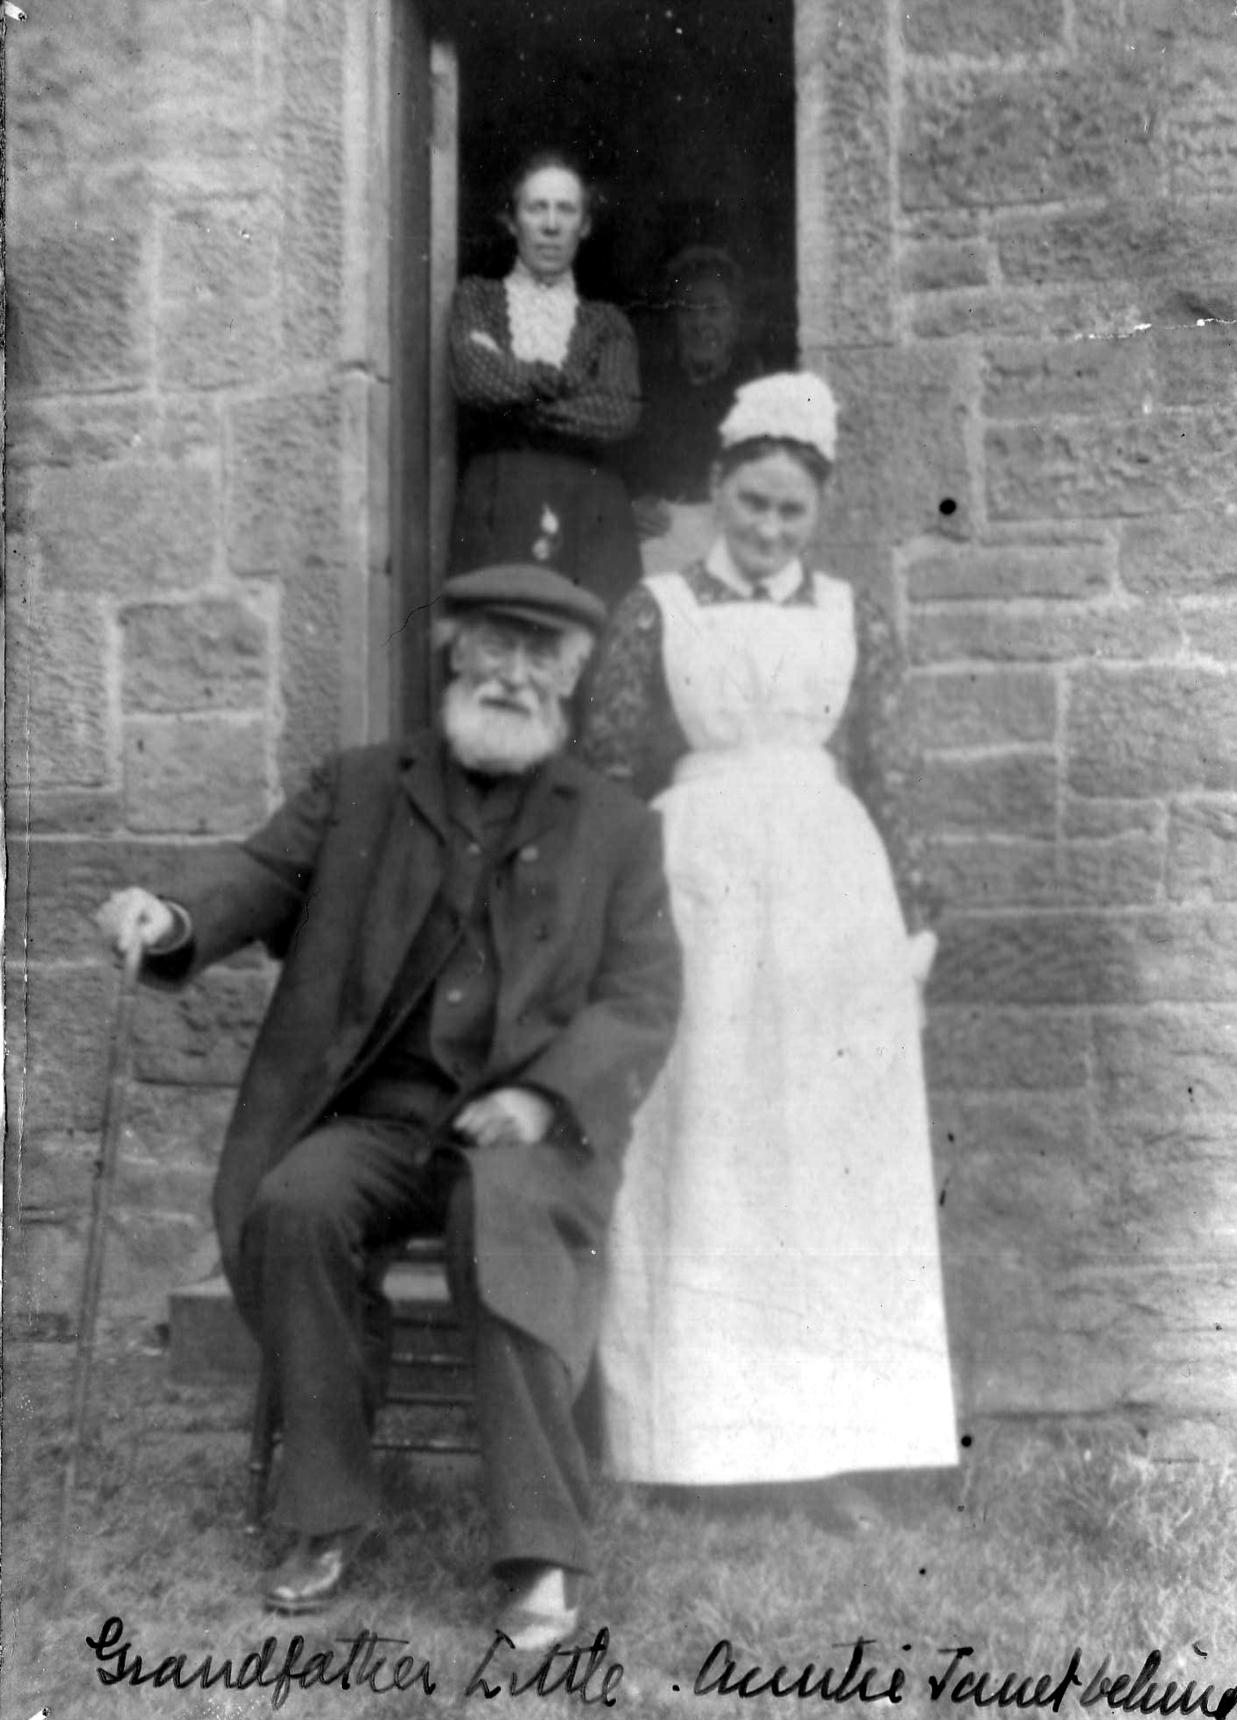 Elderly Gentleman Sitting By Doorway With Maid 1880s